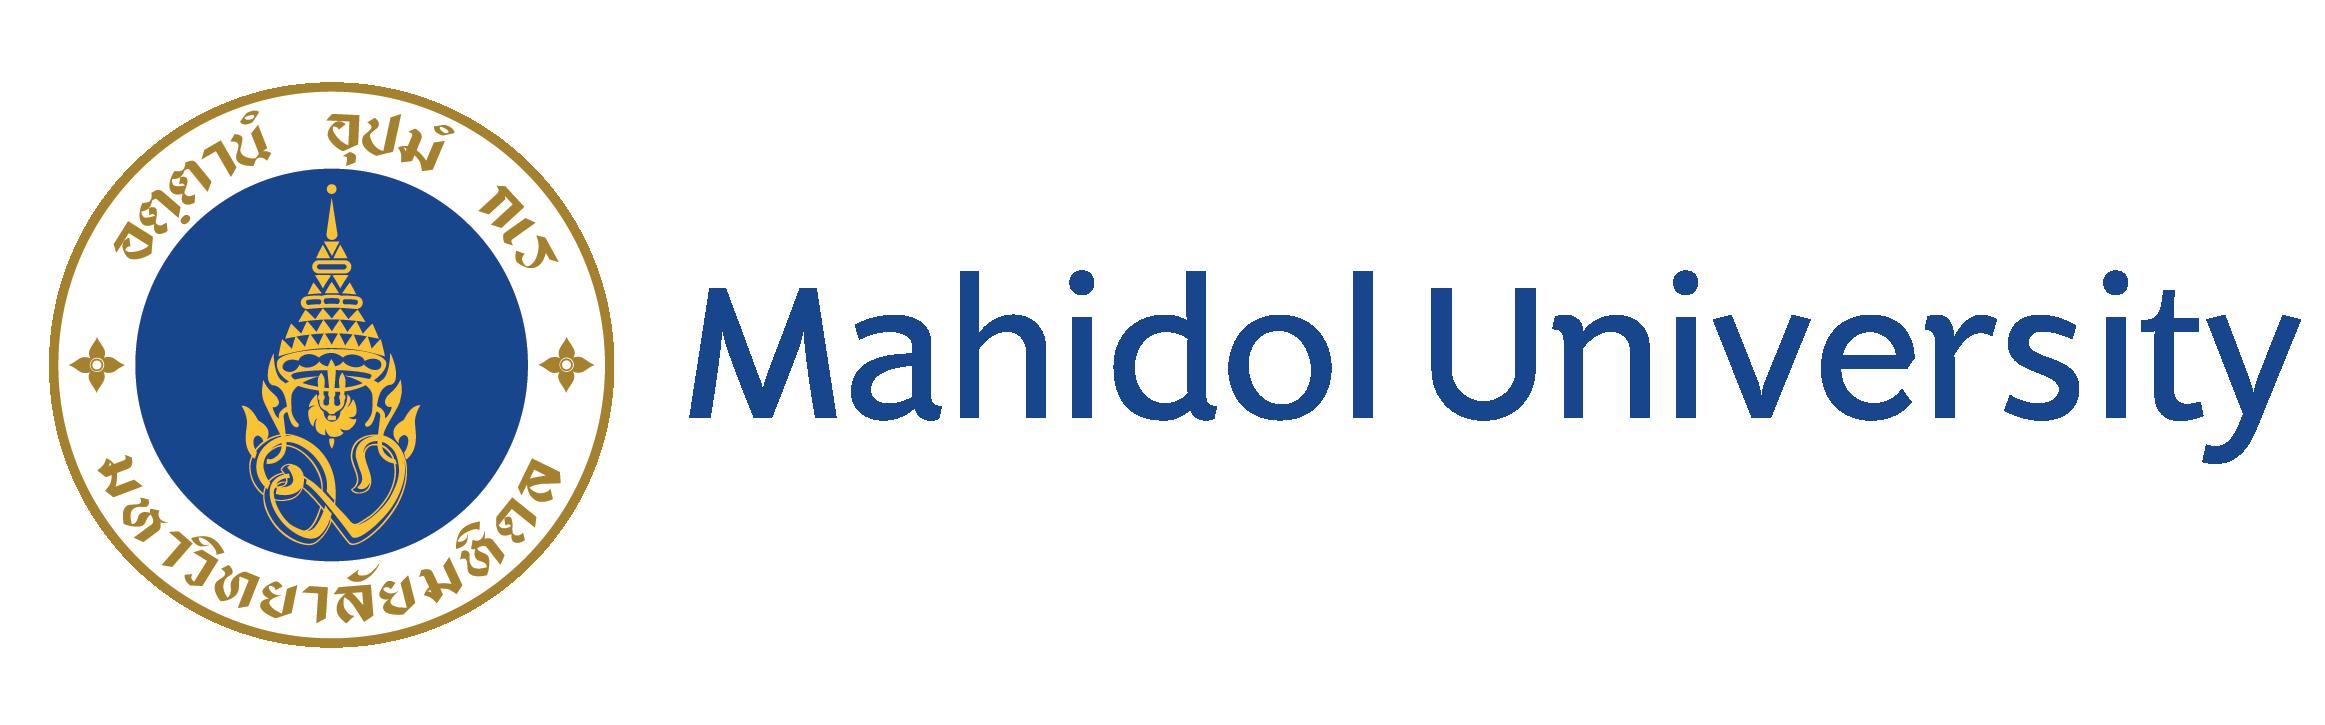 Logo Corporate Identity – Mahidol University